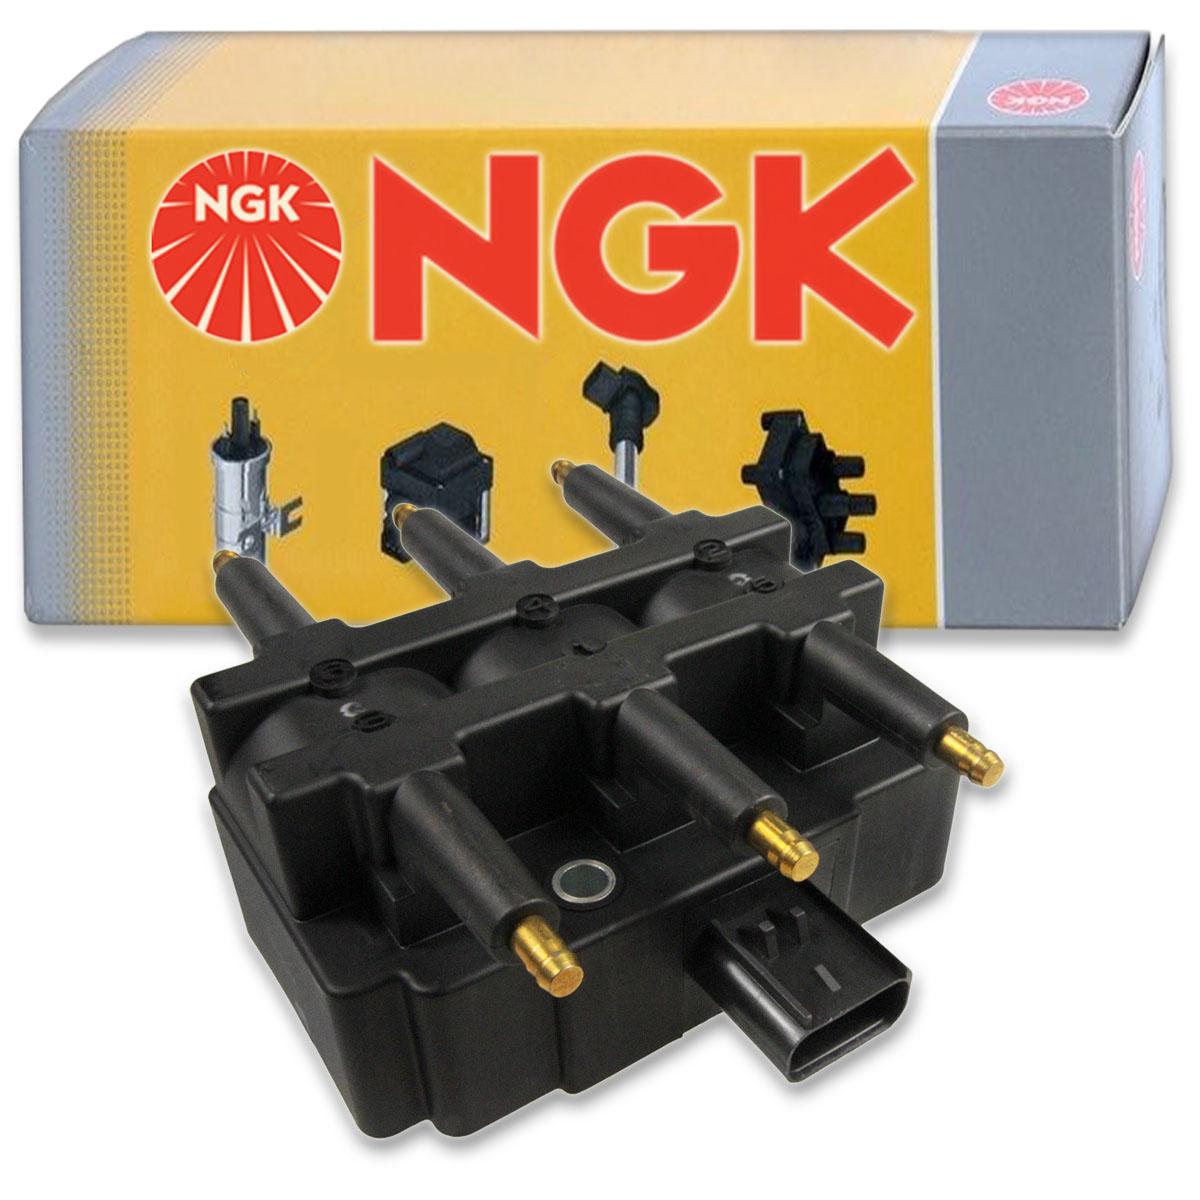 6 X NGK V-Power Plug Spark Plugs 2007-2011 Jeep Wrangler 3.8L V6 Kit Set Tune